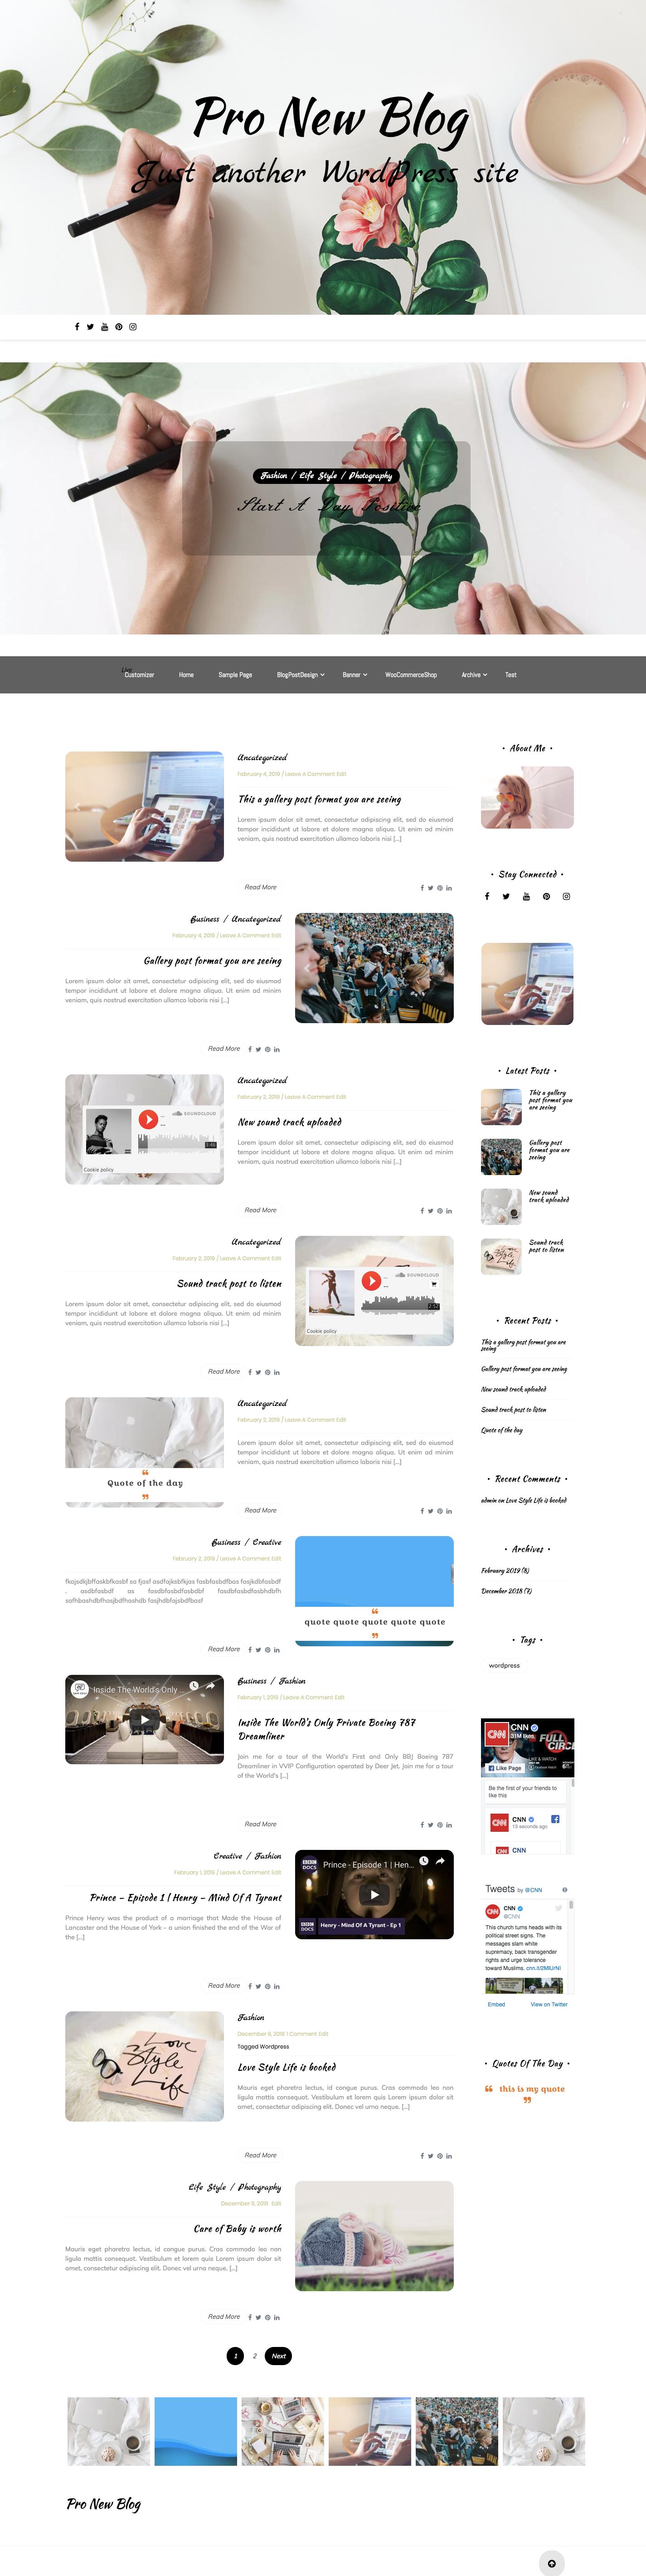 Pro New blog wordpress theme